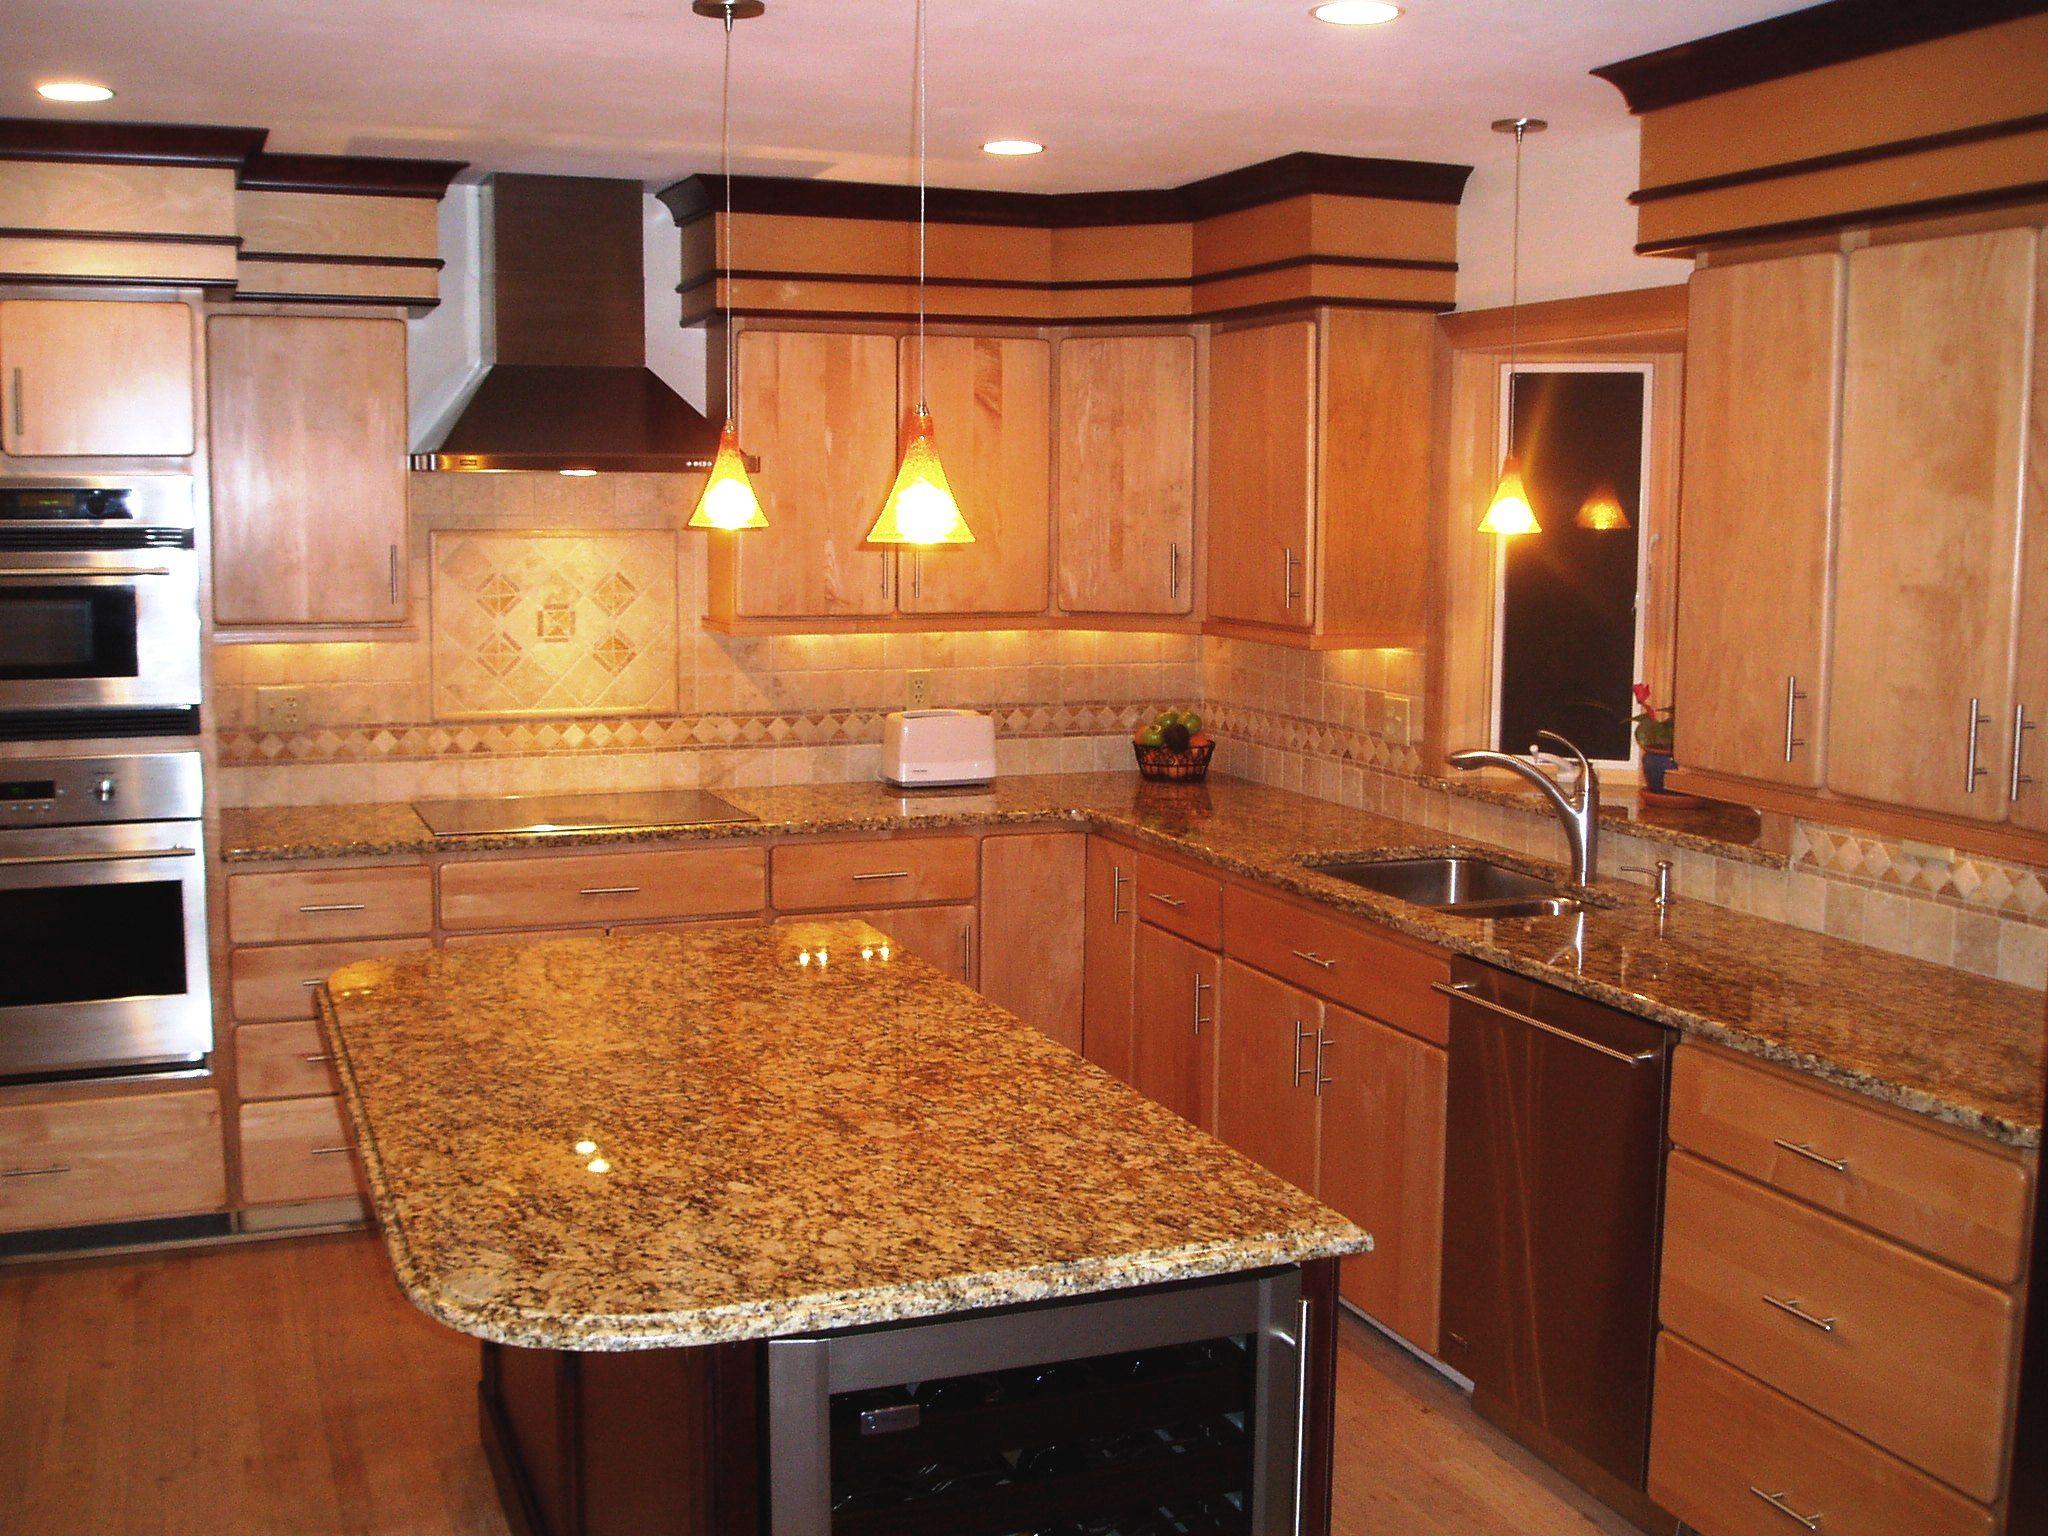 custom granite tops kitchen granite countertops best images about Custom Granite Tops on Pinterest Granite countertops colors Kitchen ideas and Granite counters